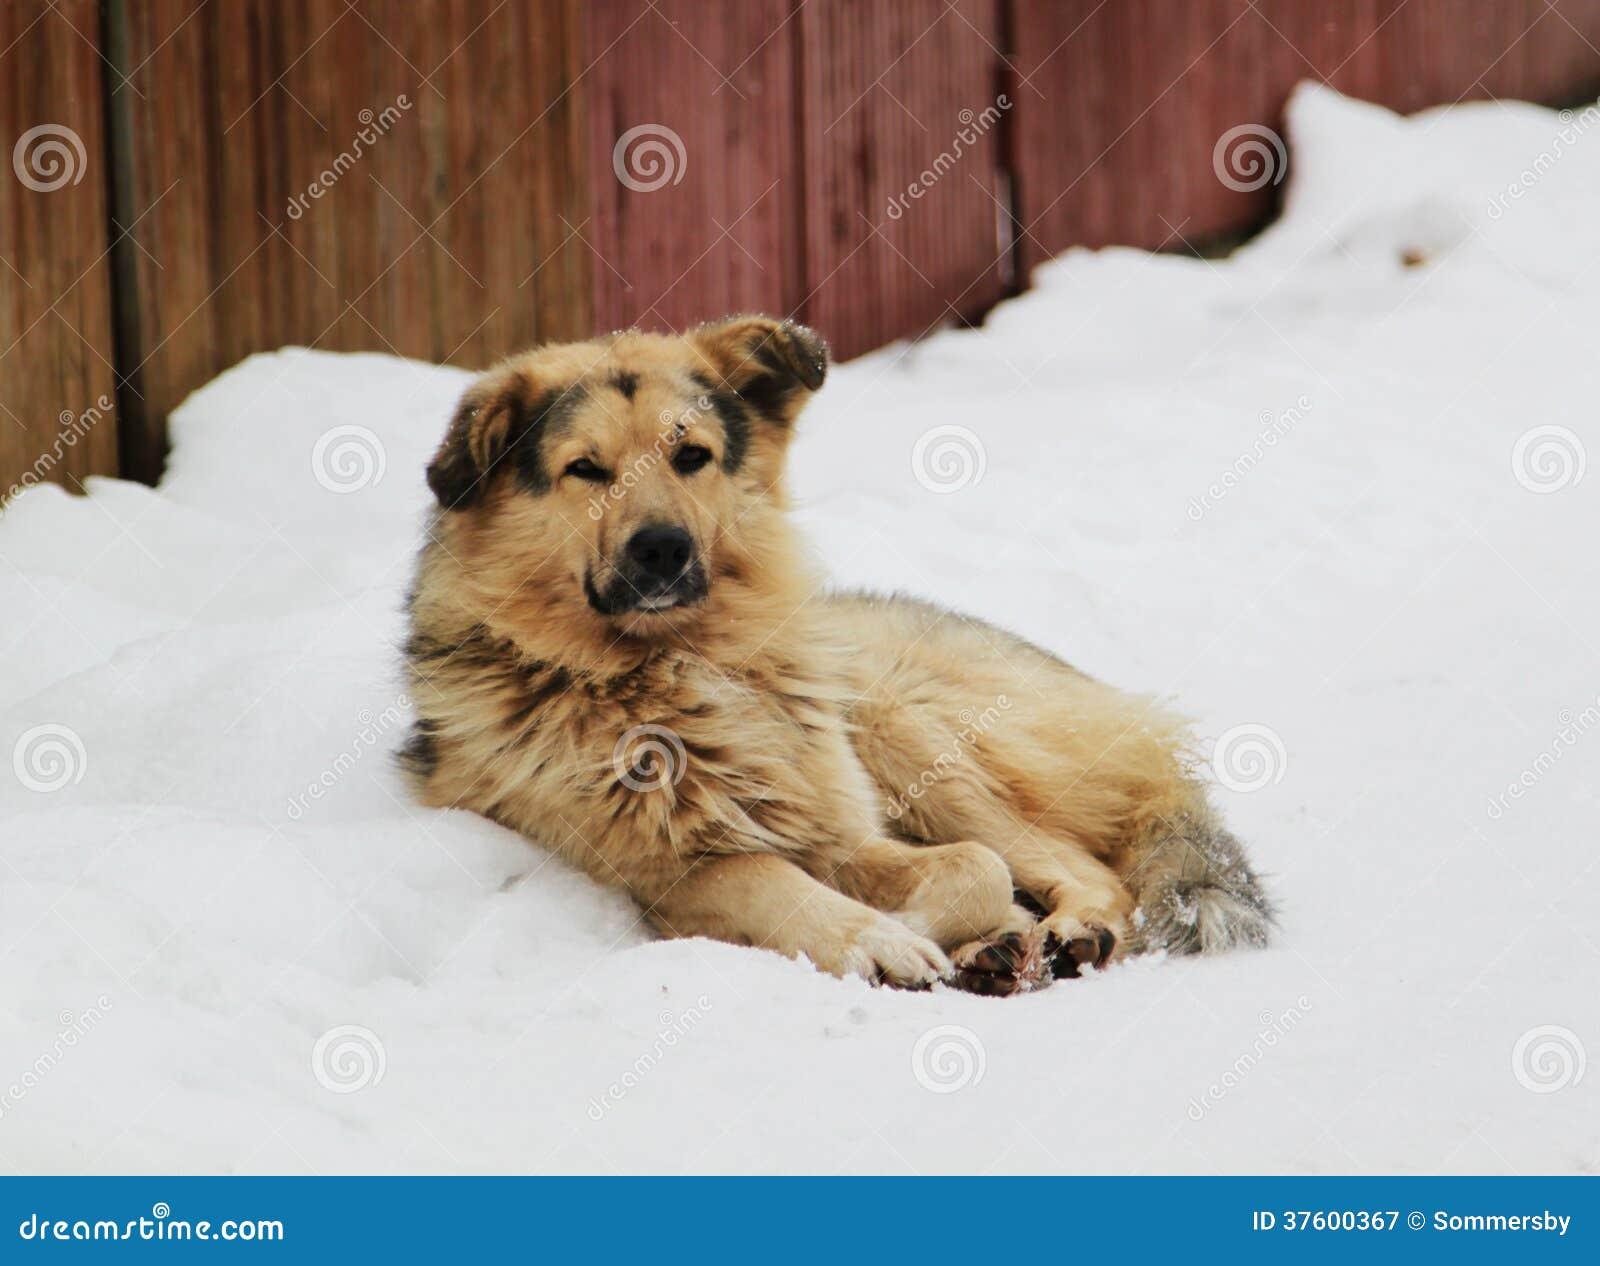 Stray Dog With Sad Eyes Royalty Free Stock Photography ...